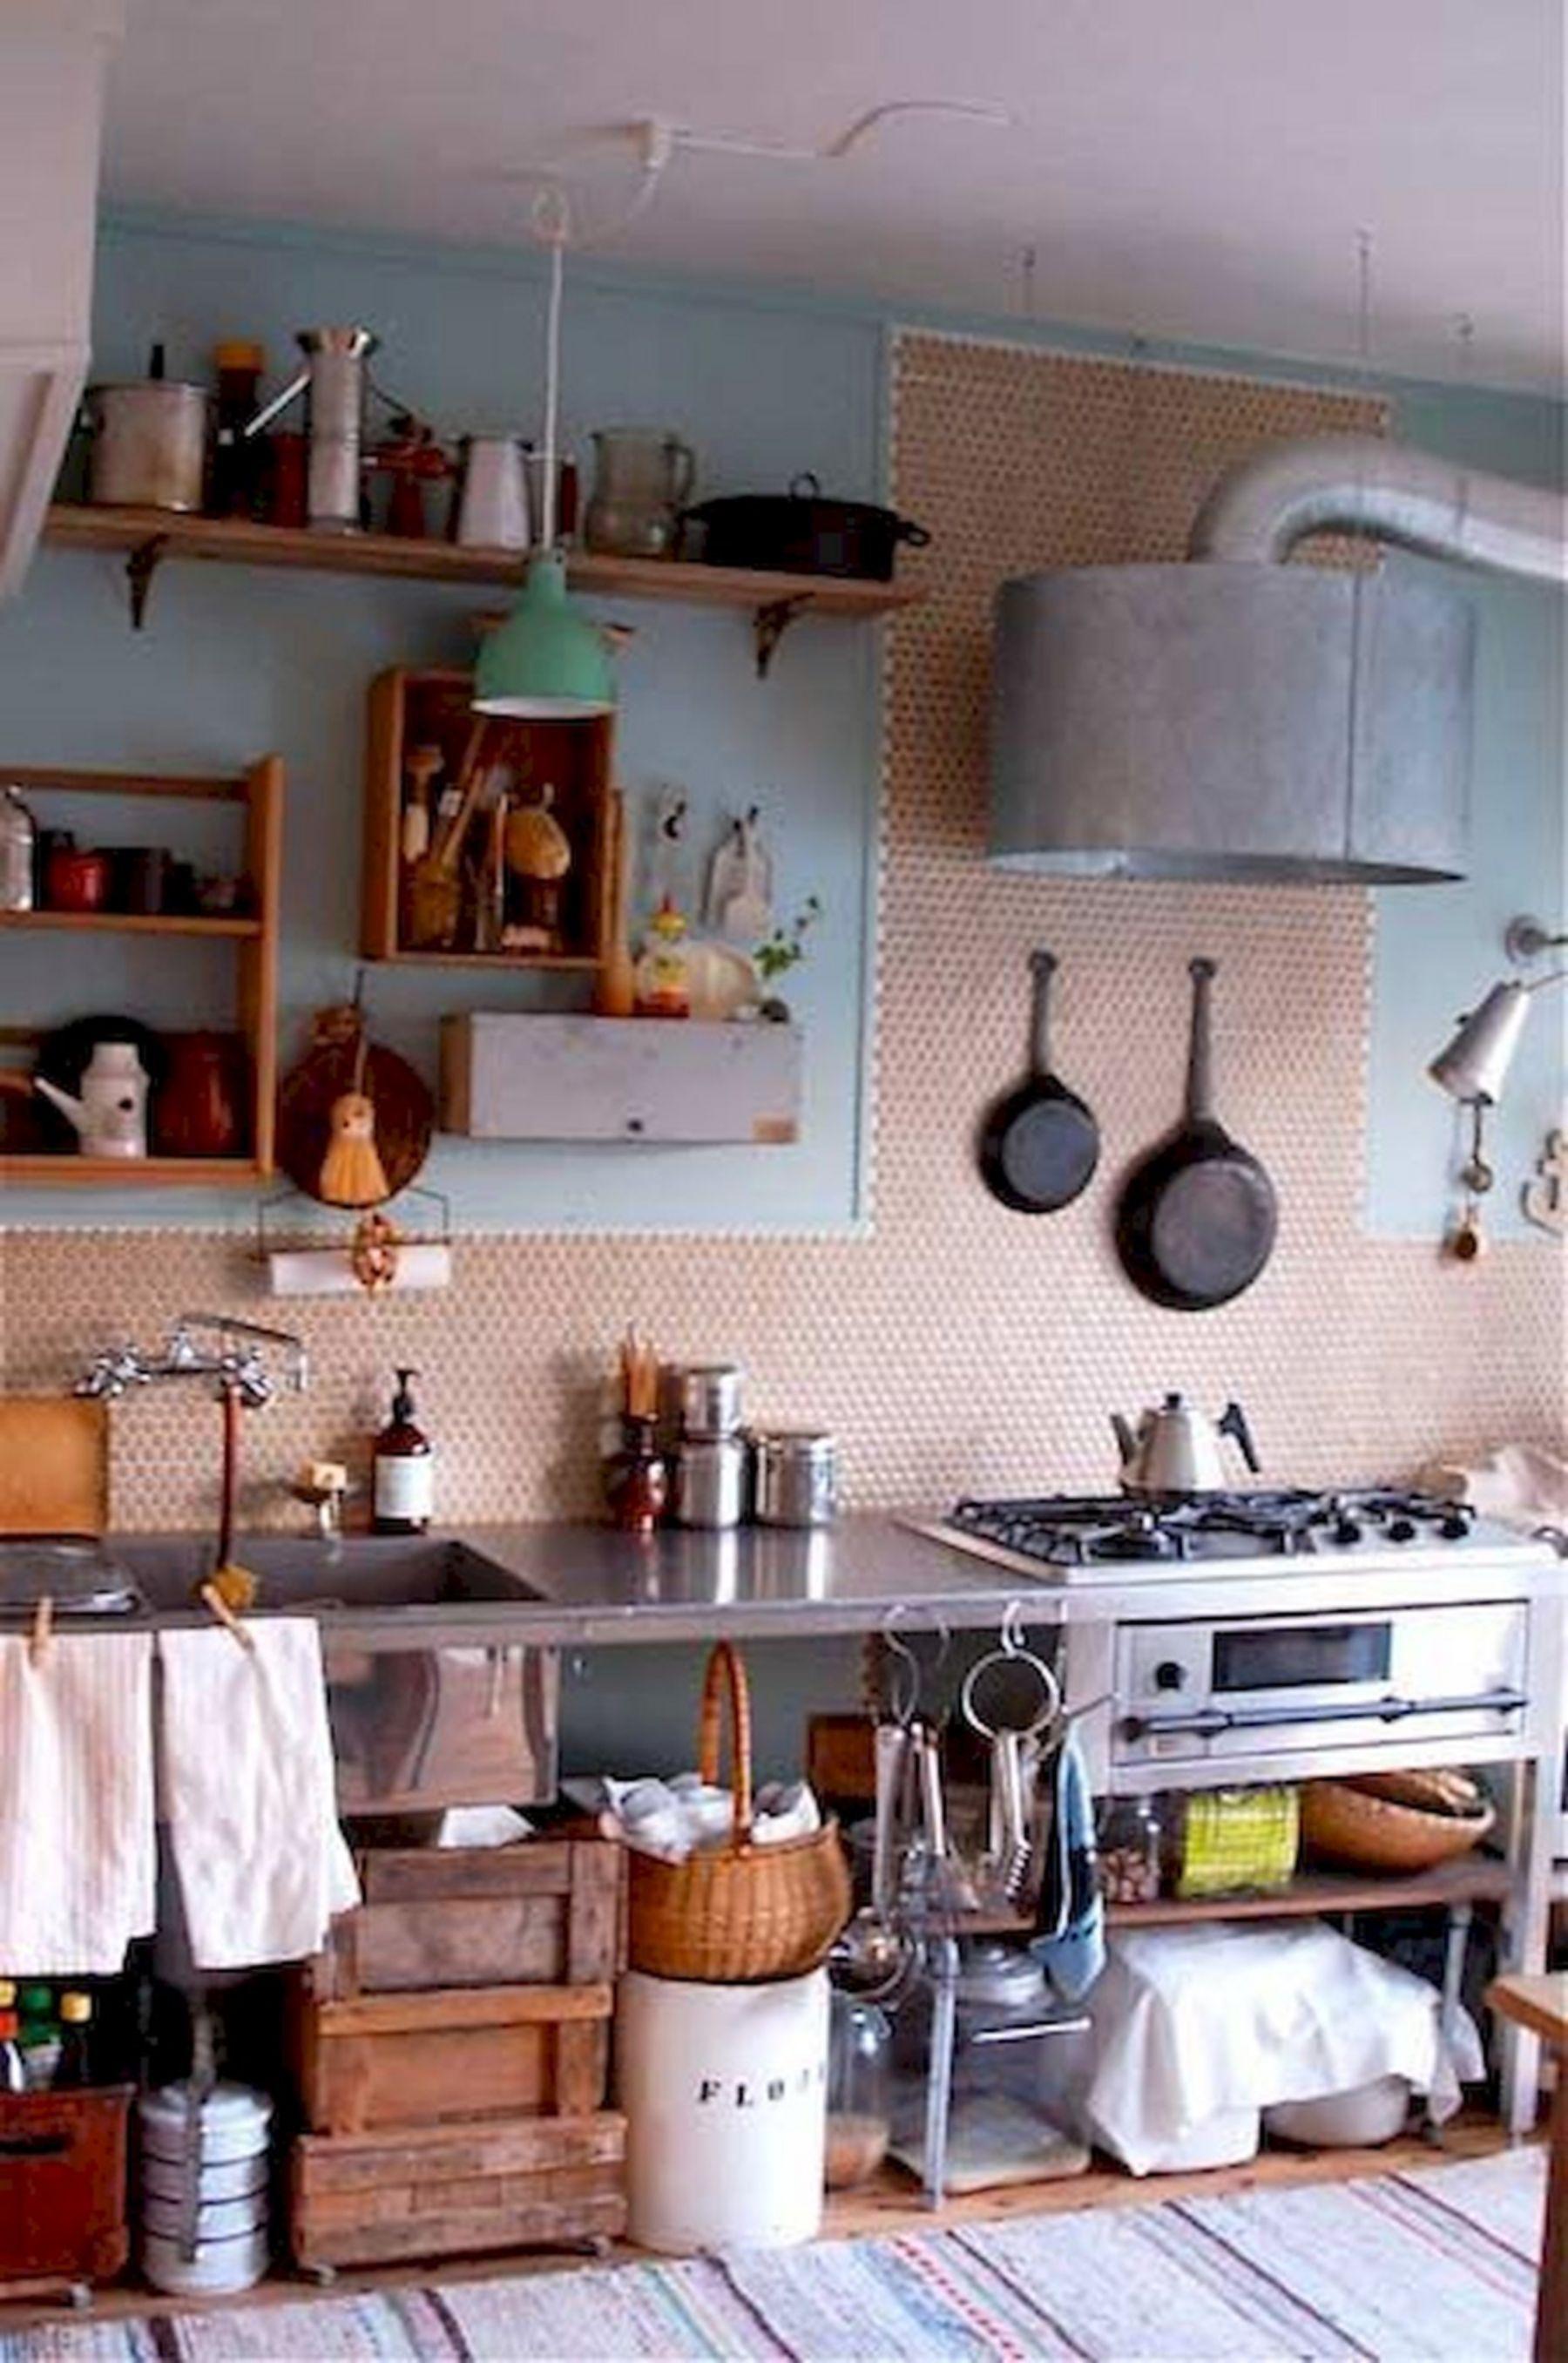 25 Cozy Bohemian Kitchen Design Ideas For Your Kitchen